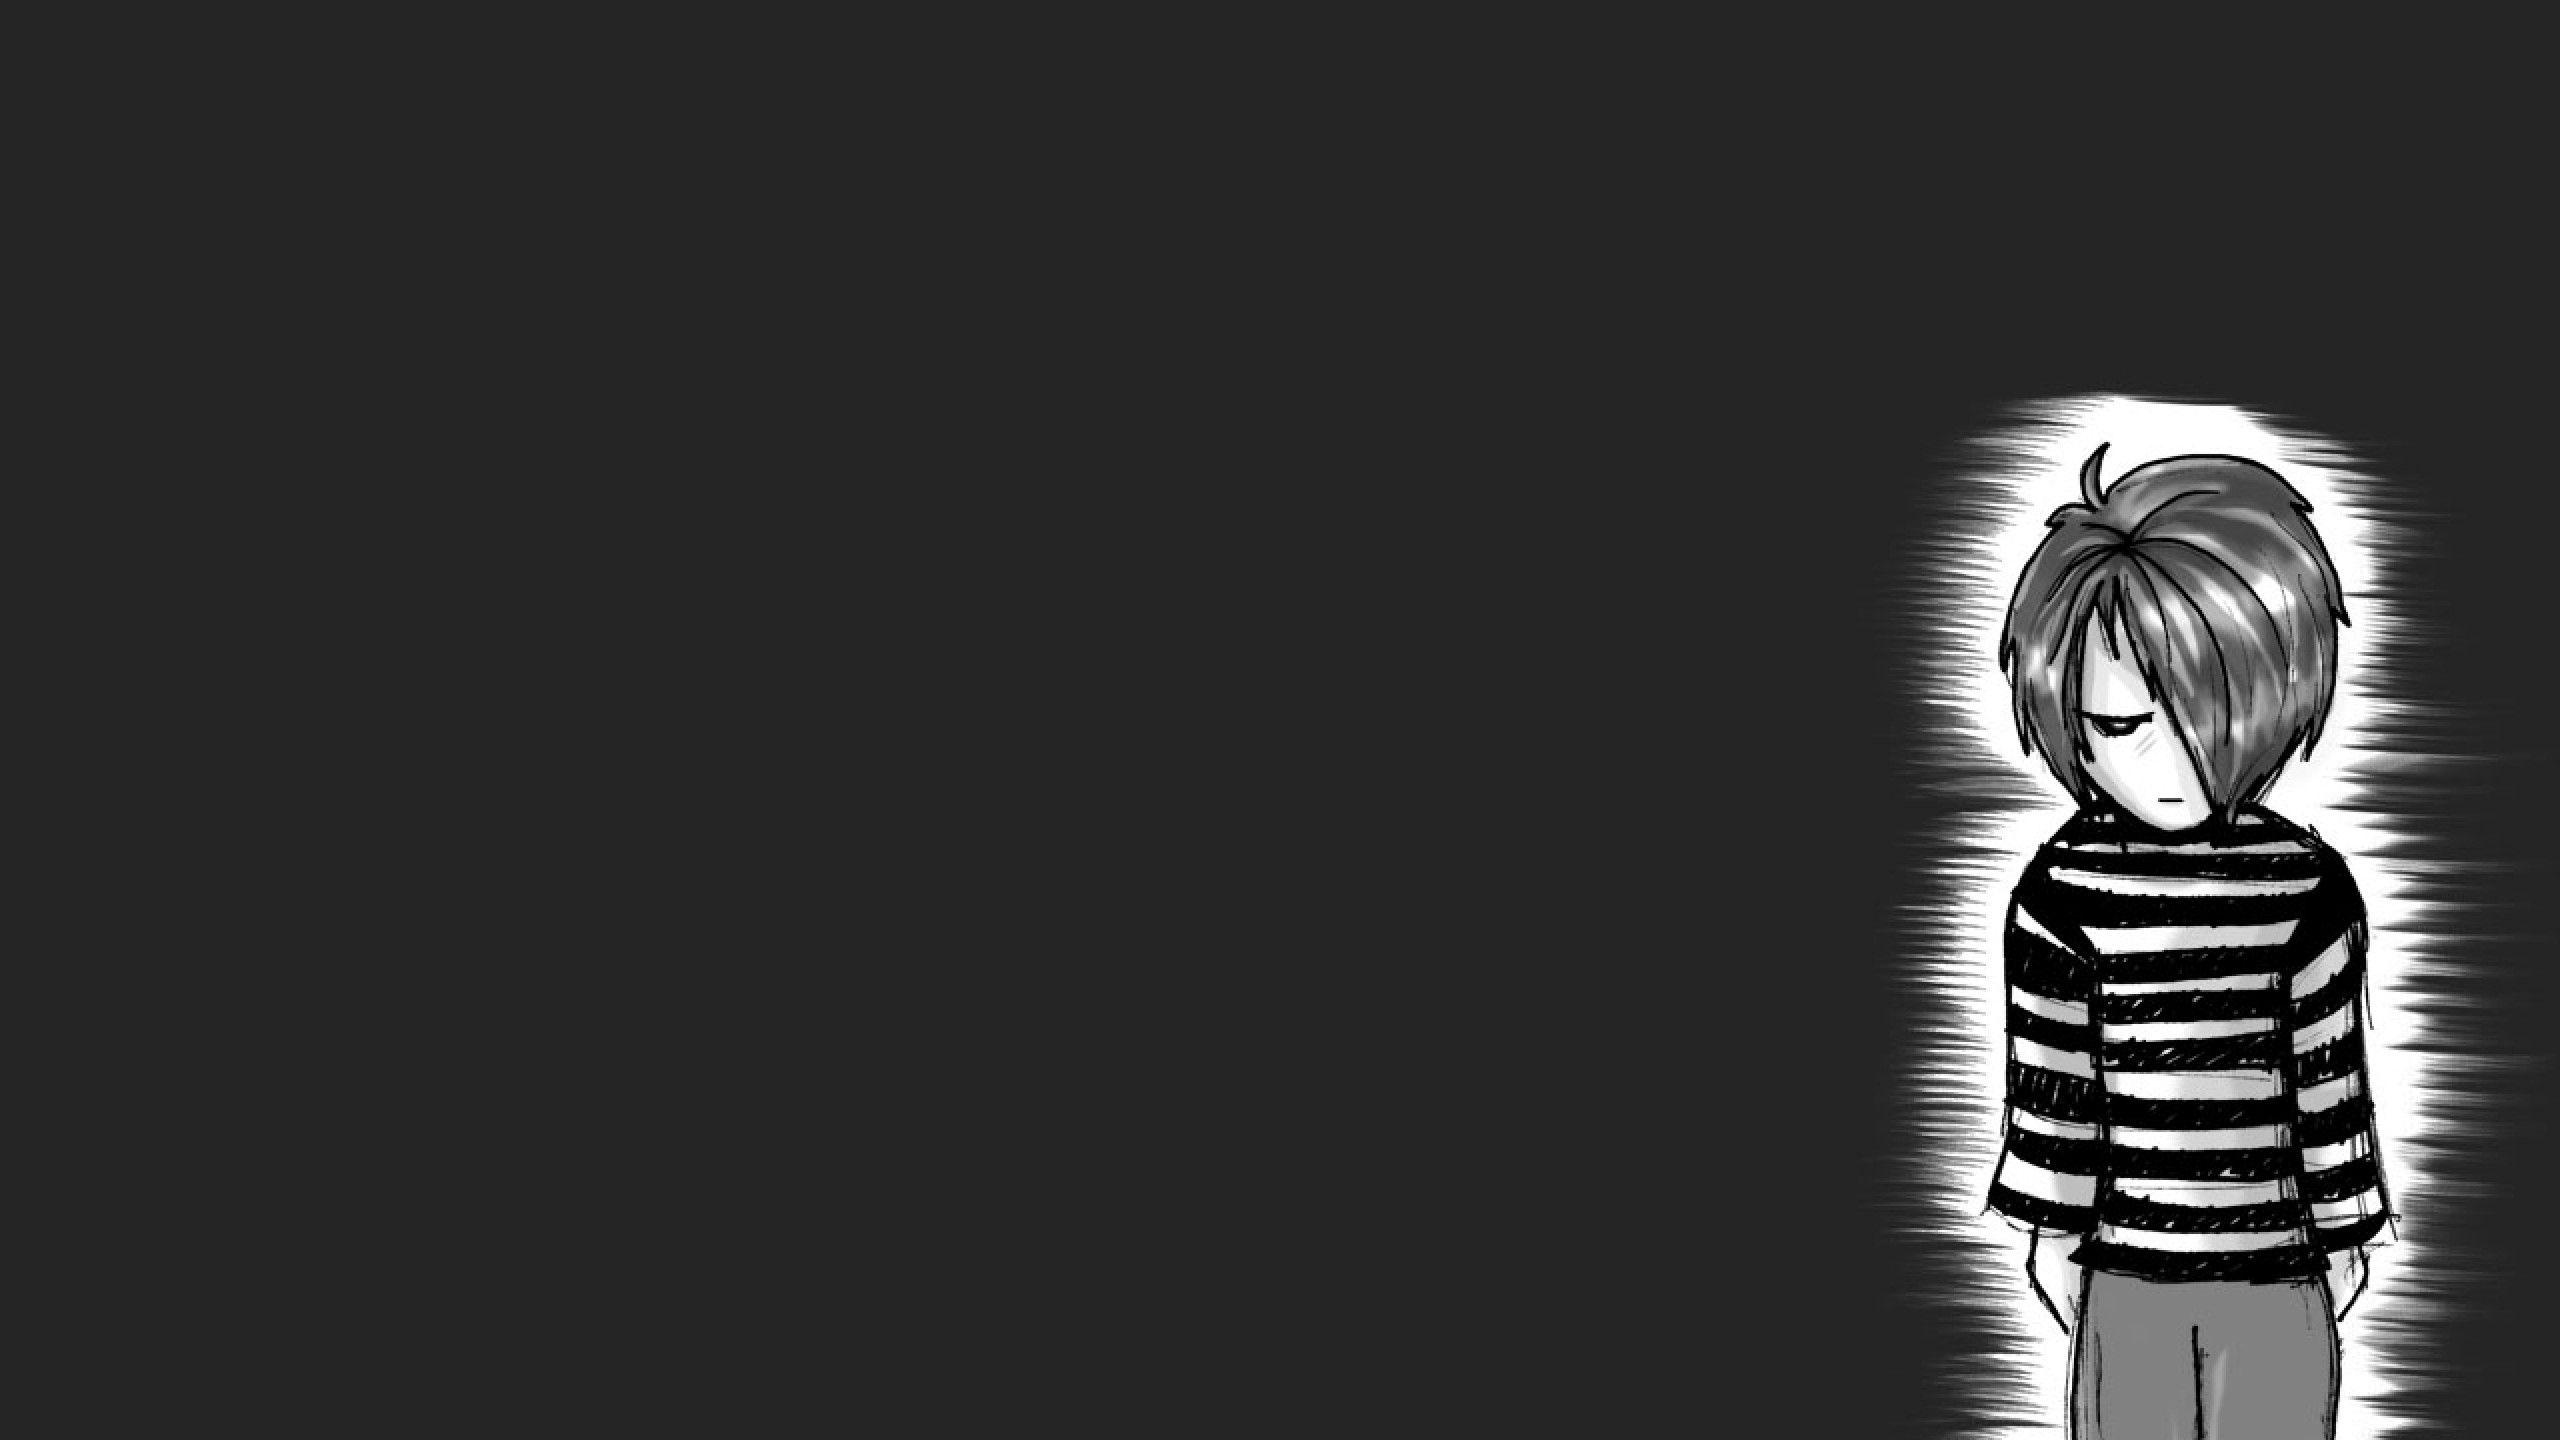 Emo Wallpapers Wallpaper 1920×1080 Emo Wallpapers HD (55